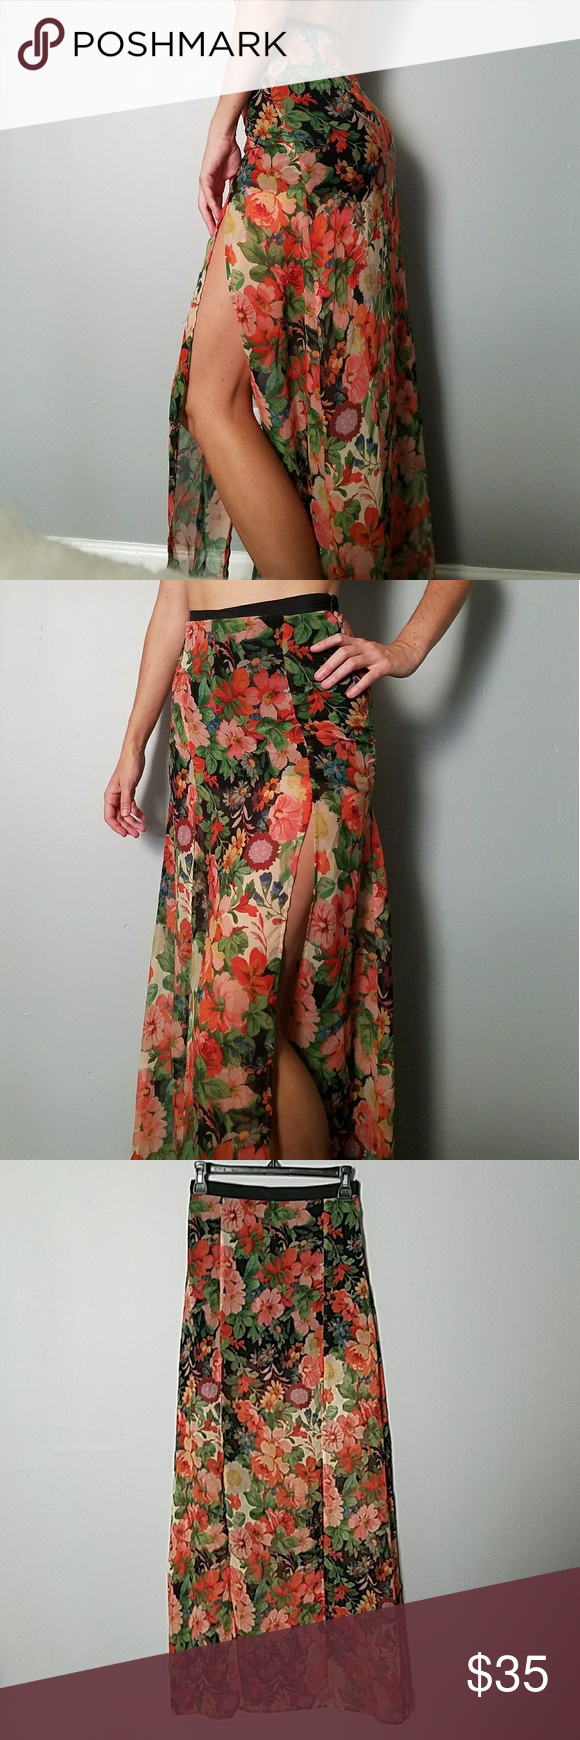 Topshop high waisted maxi skirt with shorts my posh picks